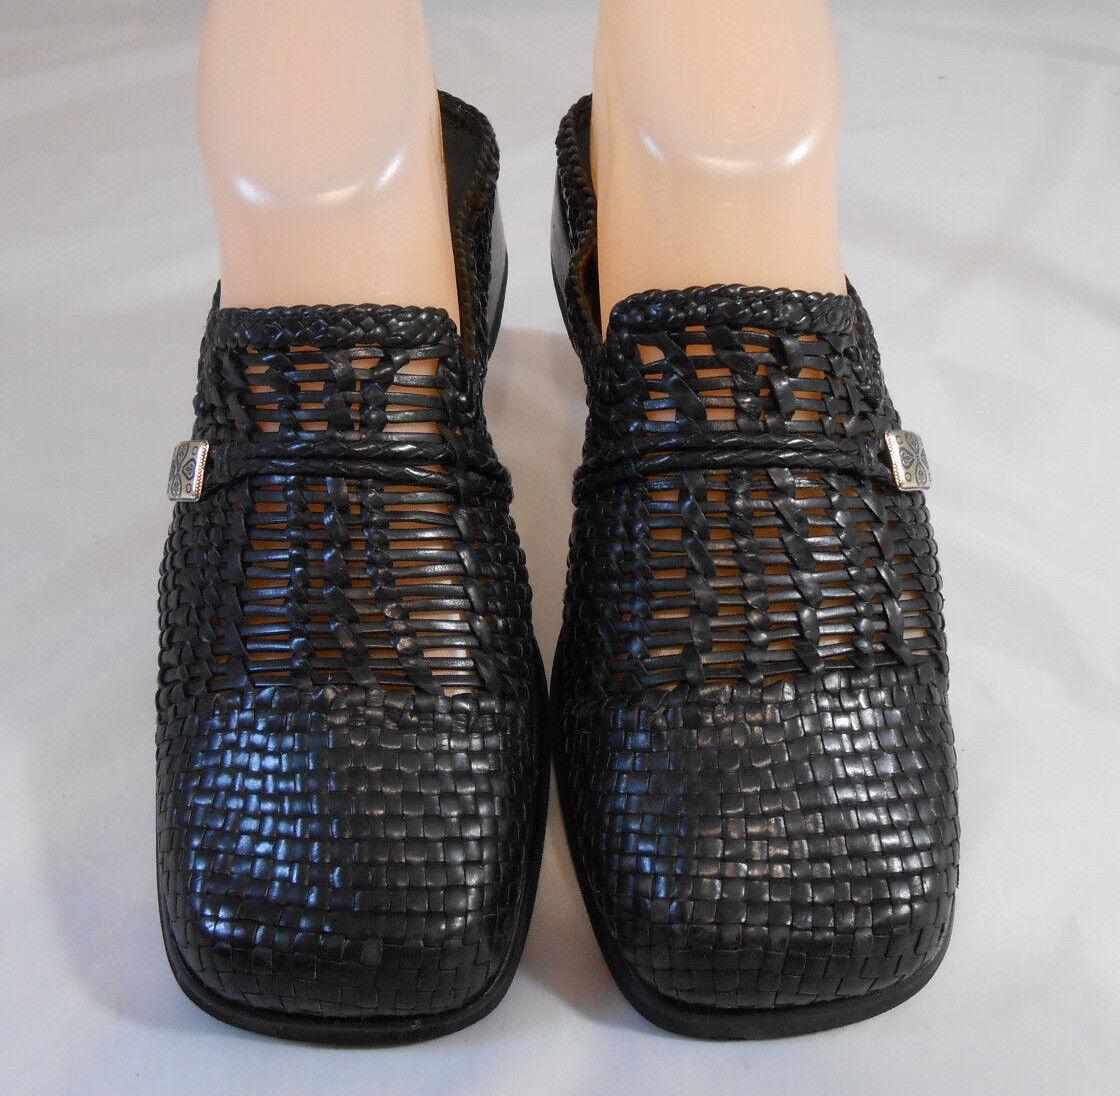 BRIGHTON On Womens BRENDA Black Low Block Heel Slip On BRIGHTON Mules Size 7 M a95d10